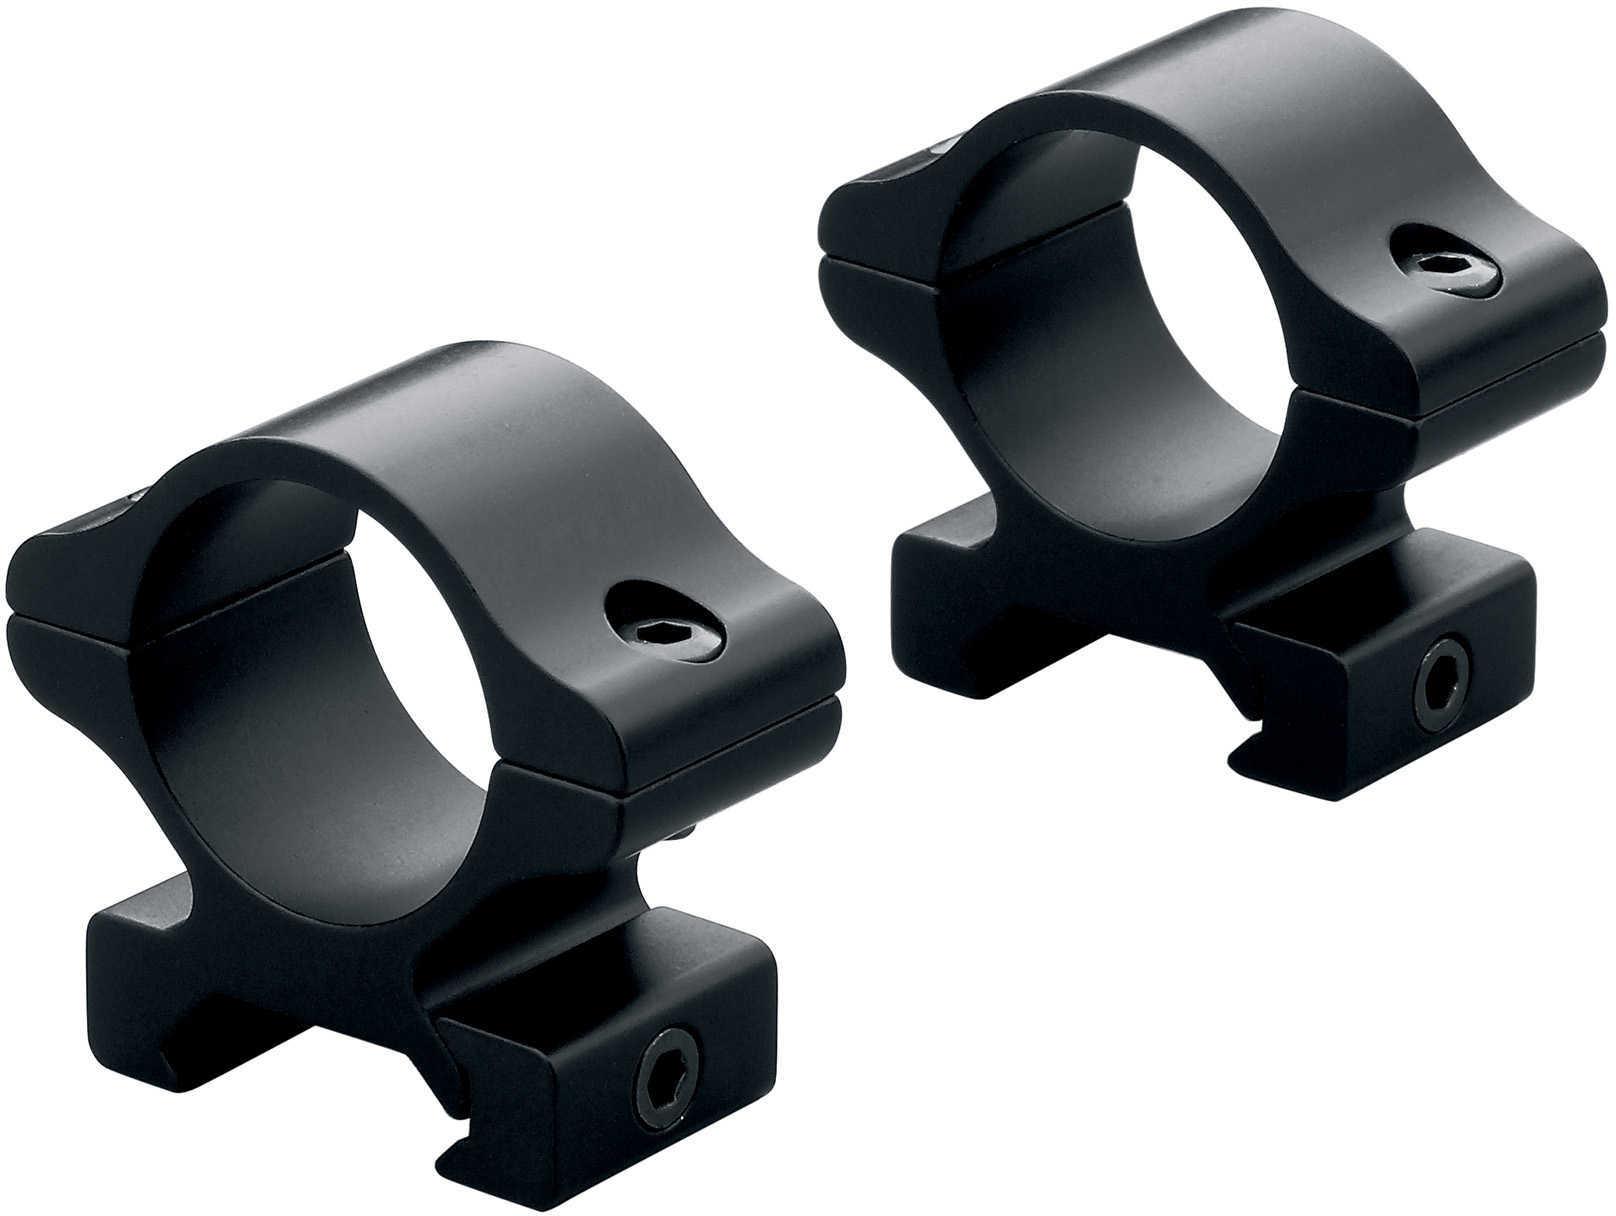 Leupold Rifleman Detachable Rings High Black Gloss Md: 57390